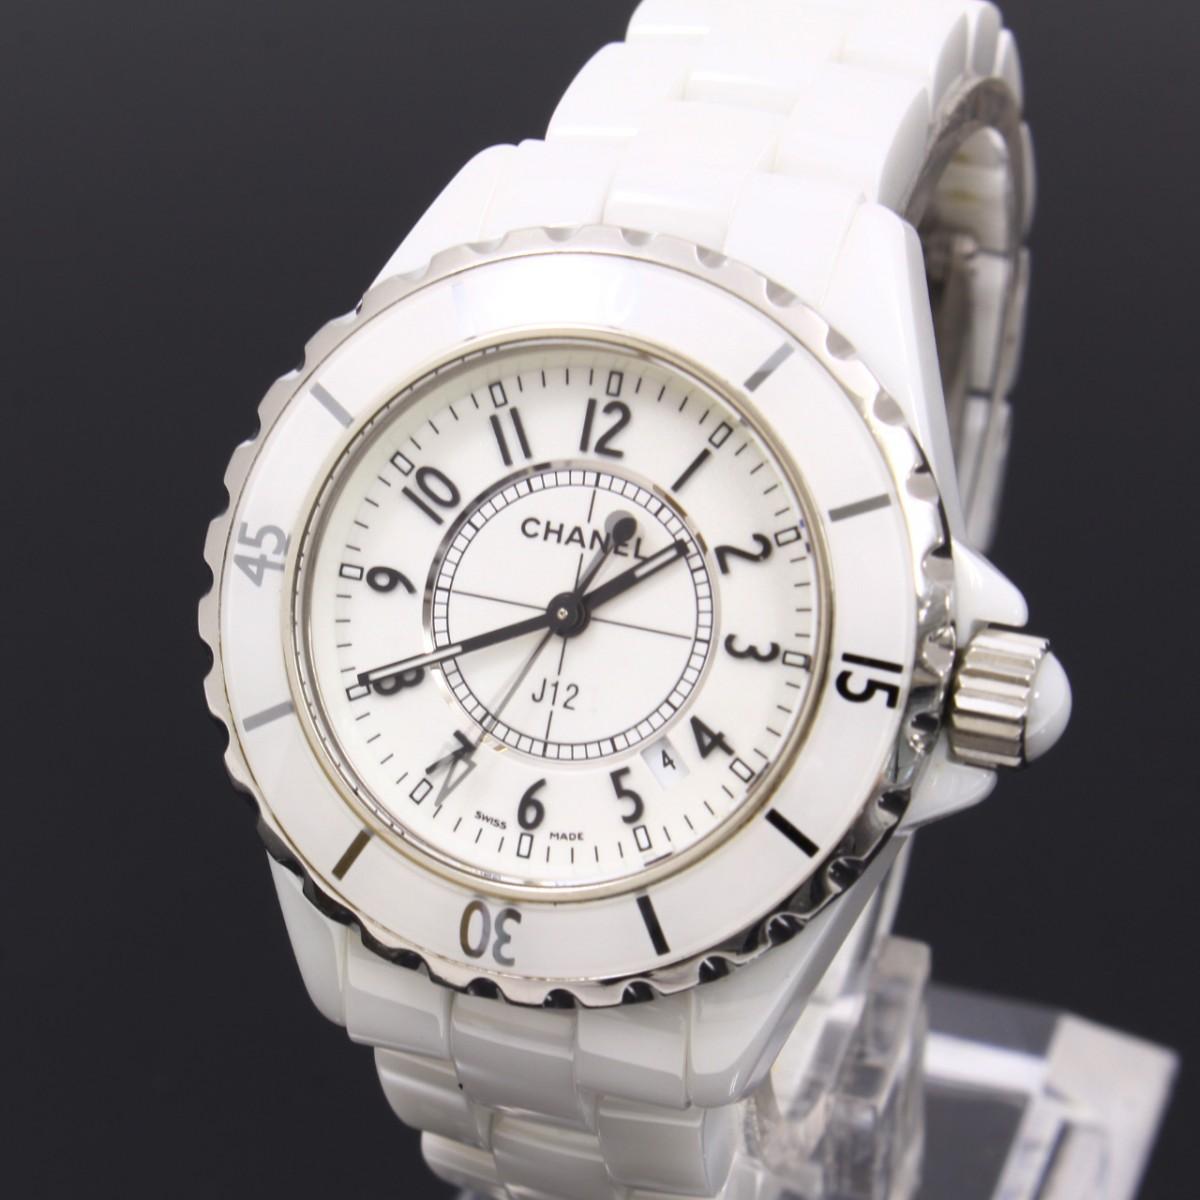 online store 0785b 6db81 大阪吹田でシャネルの腕時計 J12を買取☆|吹田買取